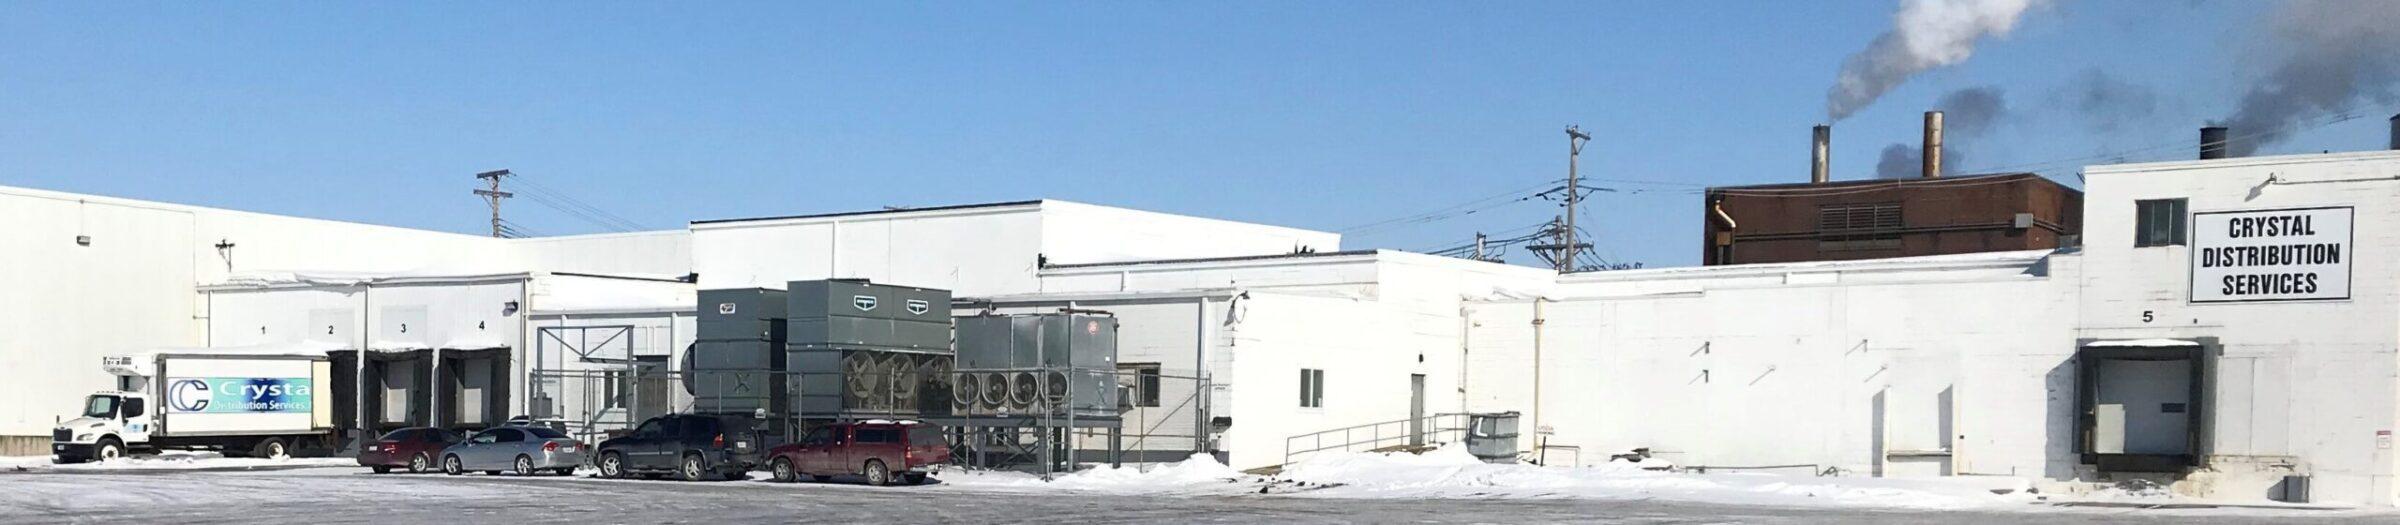 Exterior of Marshalltown Building